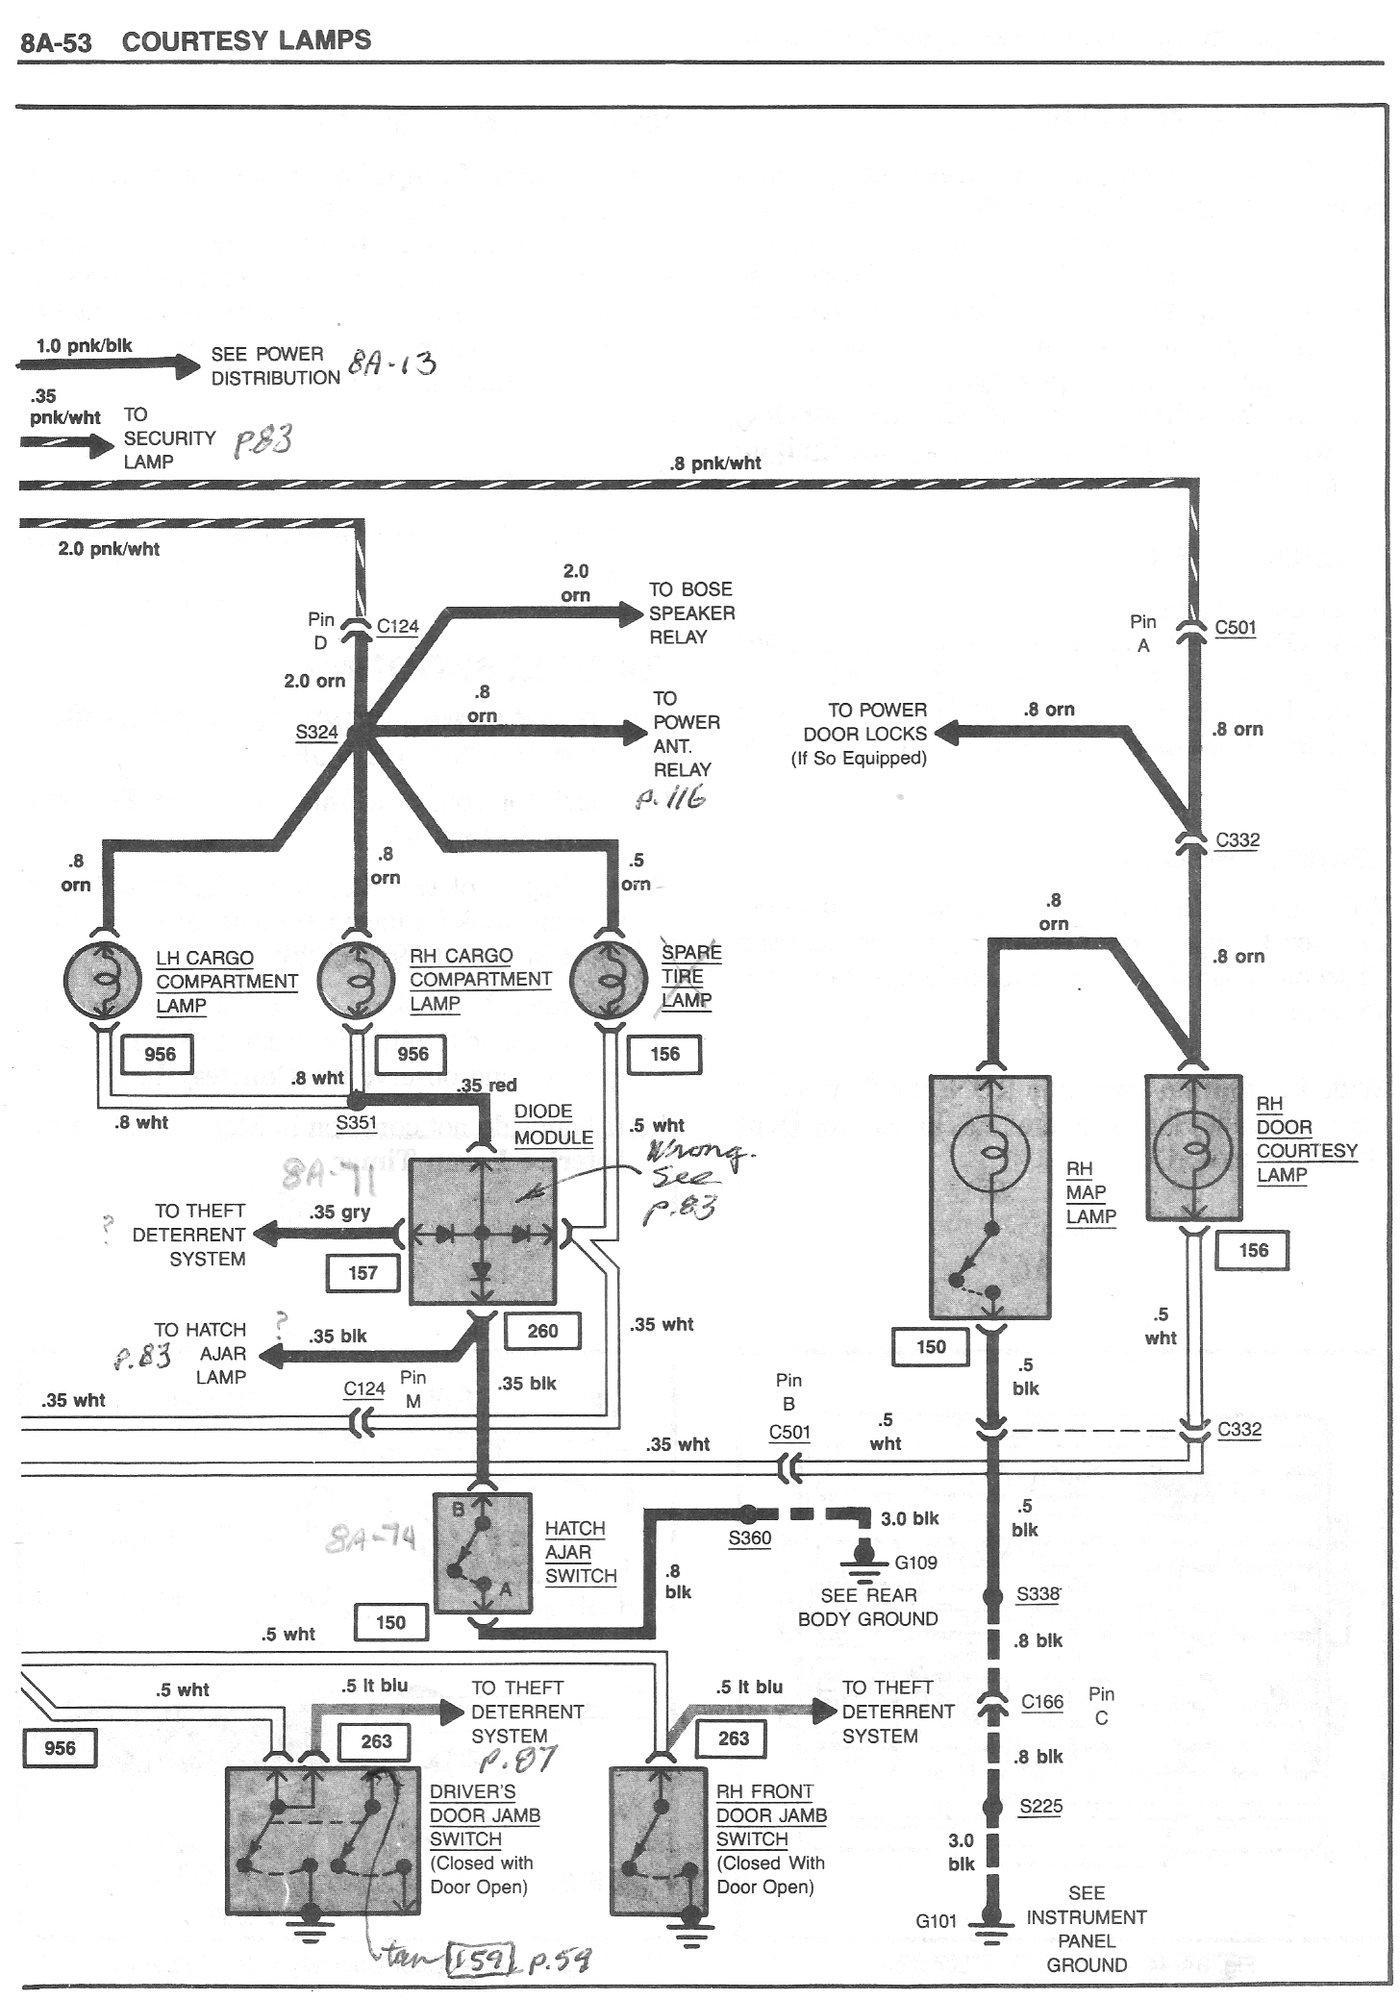 Interior Light Delay Module    Relay Fix   85-87